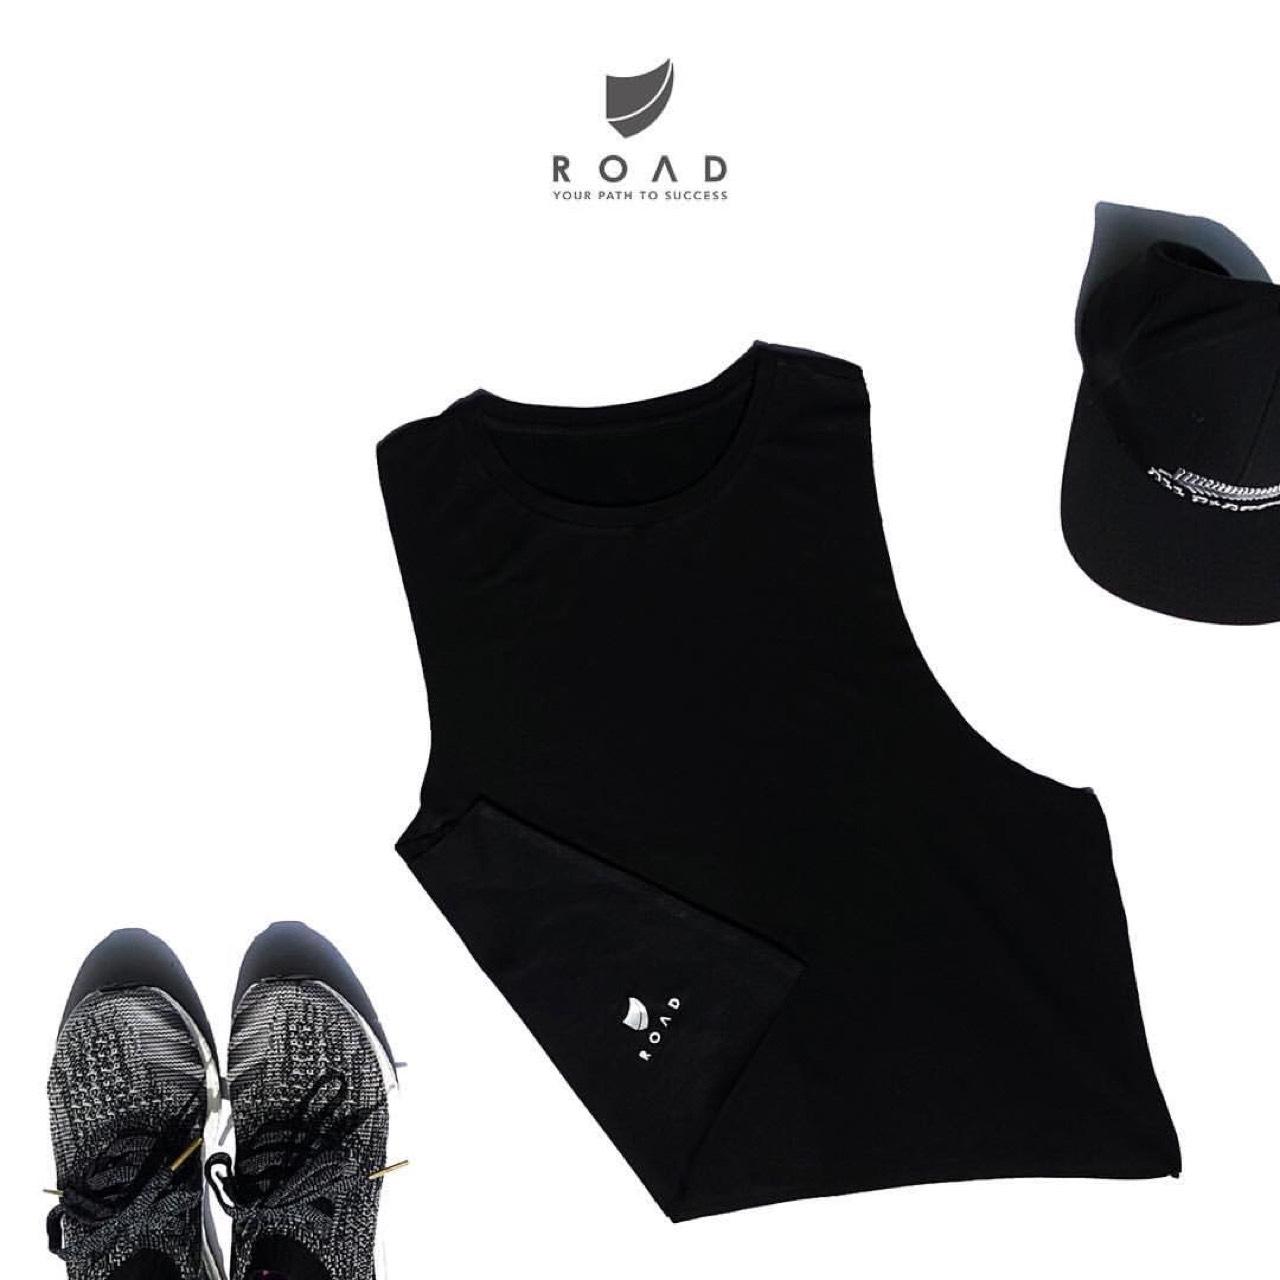 tanktop,roadfitwear,fitwear,sportswear,exercise,fitnessmotivation,quote,bodybuilding,สปอร์ตบรา,บราโยคะ,ชุดออกกำลังกาย,gym,fitness,yoga,workout,zumba,motivation,inspiration,sportsbra,bra,nike,adidas,underarmour,dance,thailand,health,healthy,diet,lululemon,gymwear,Road